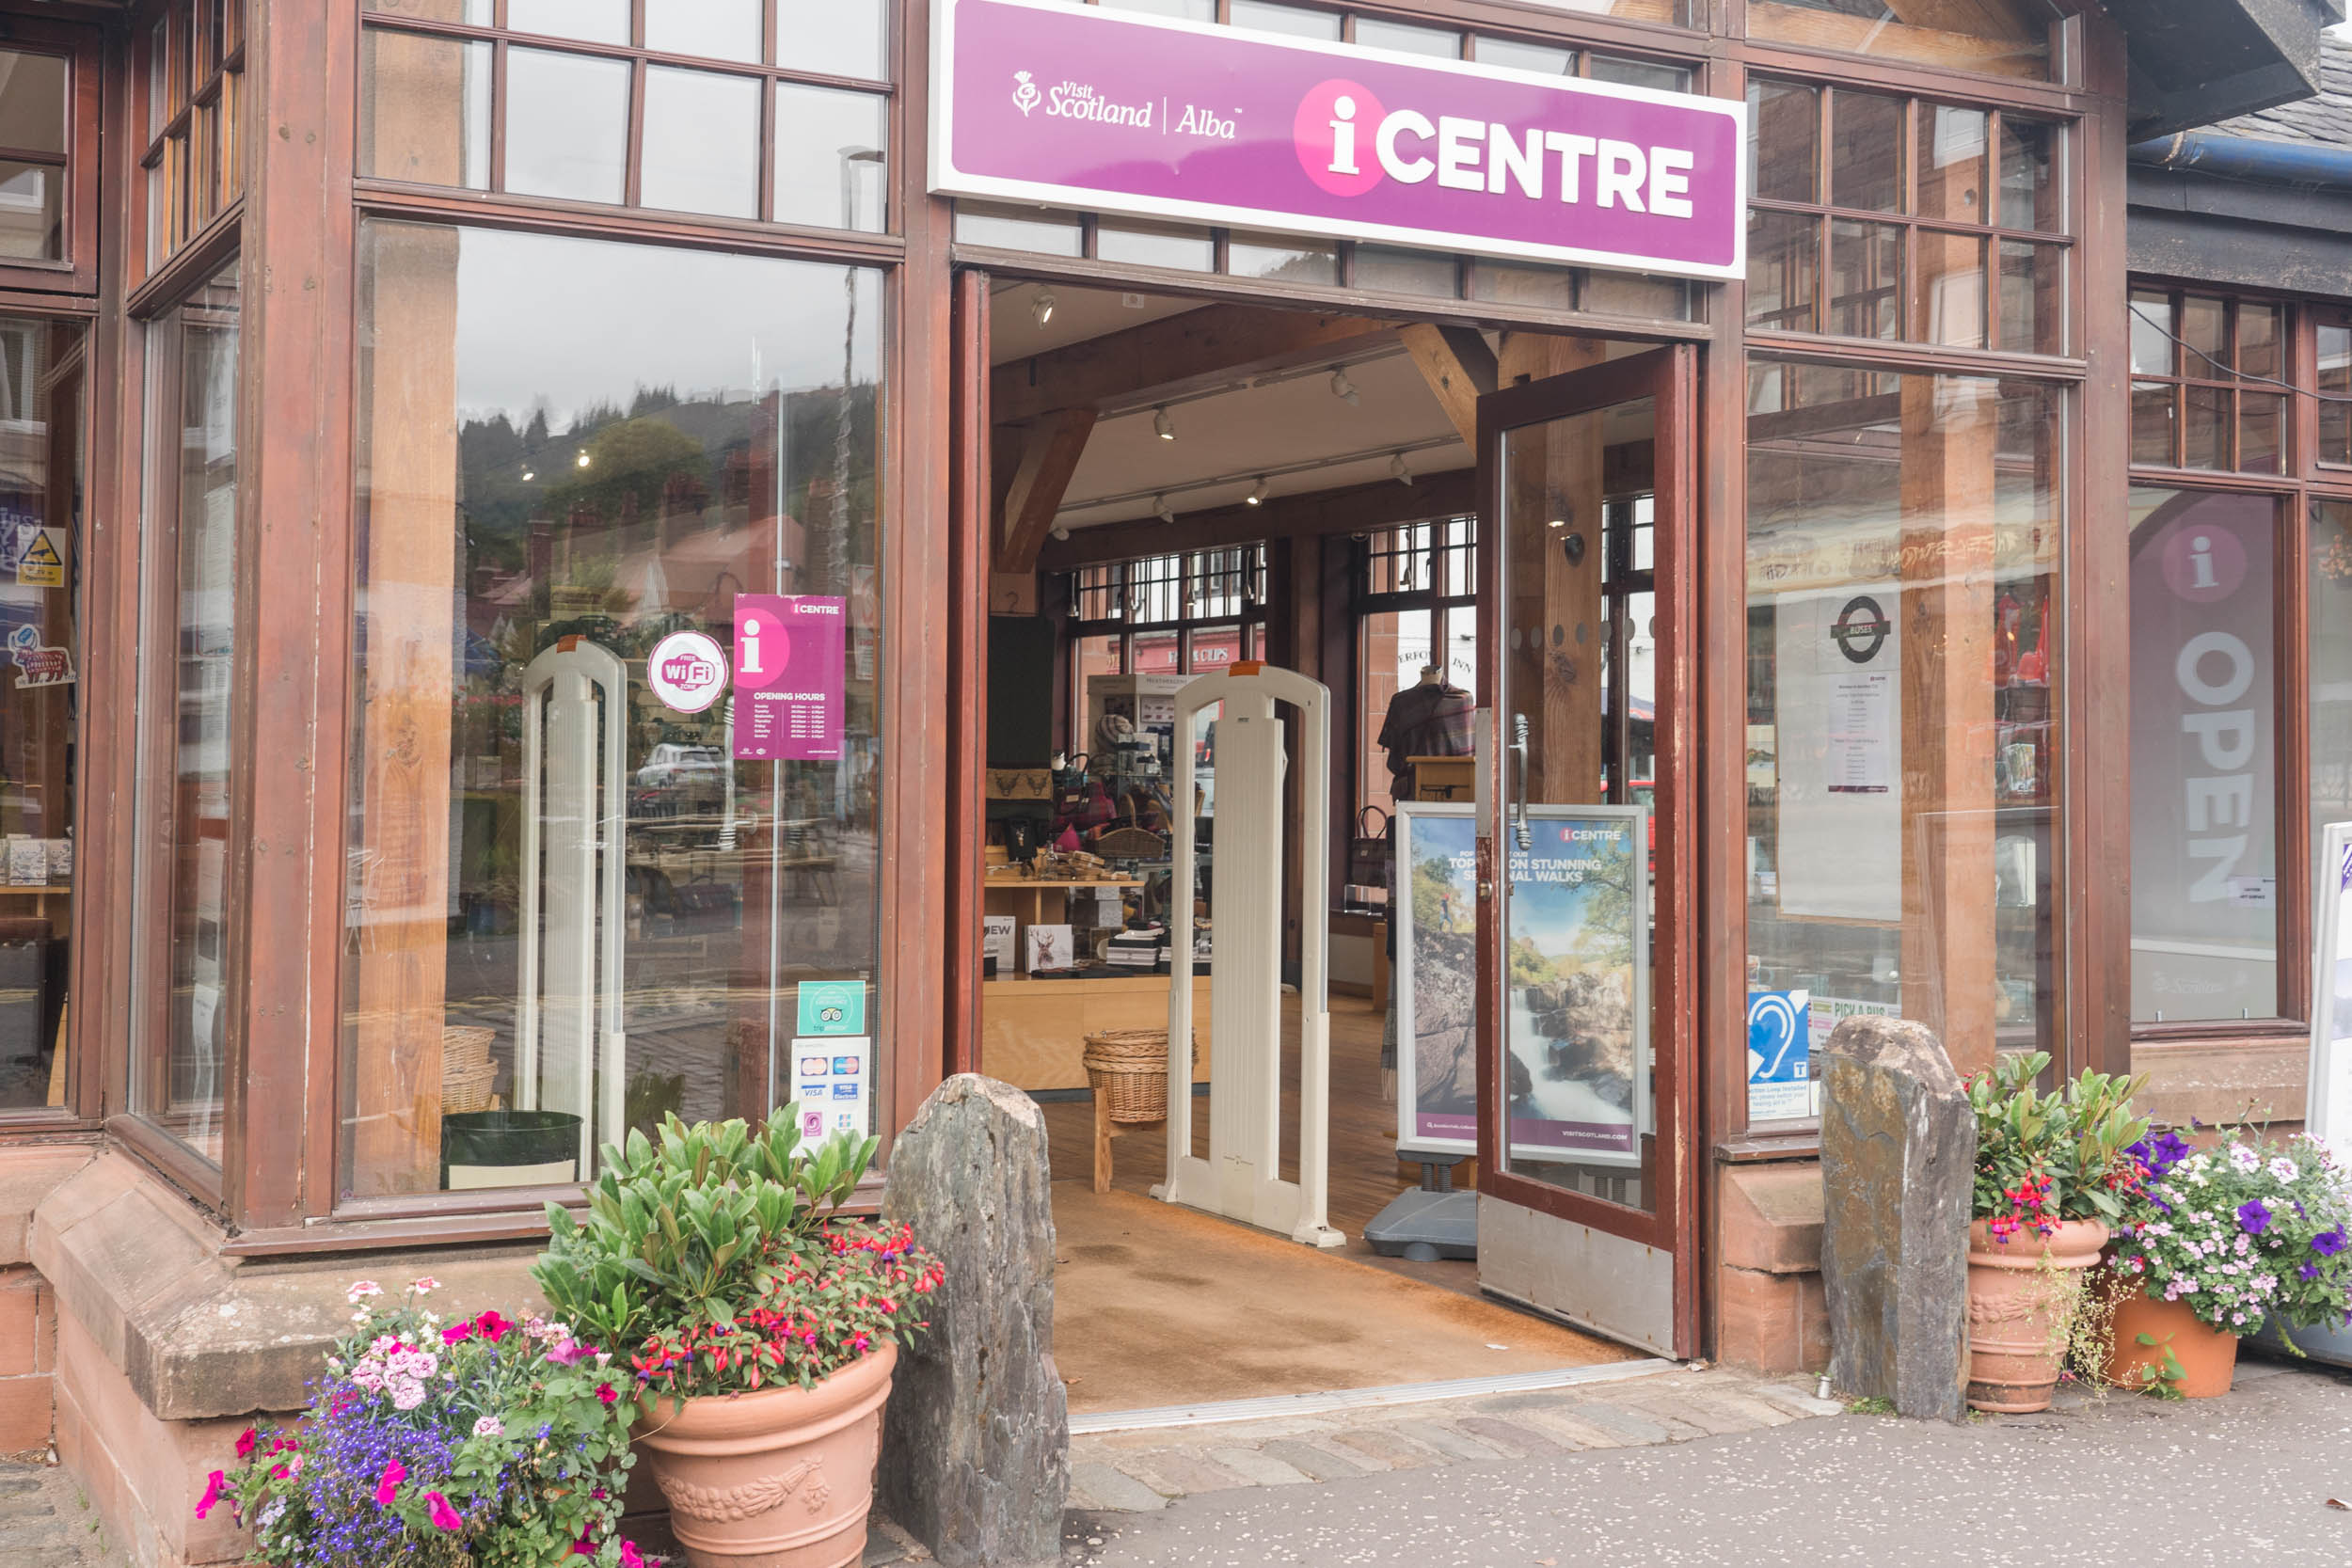 Visit Scotland, I-Centre, Aberfoyle